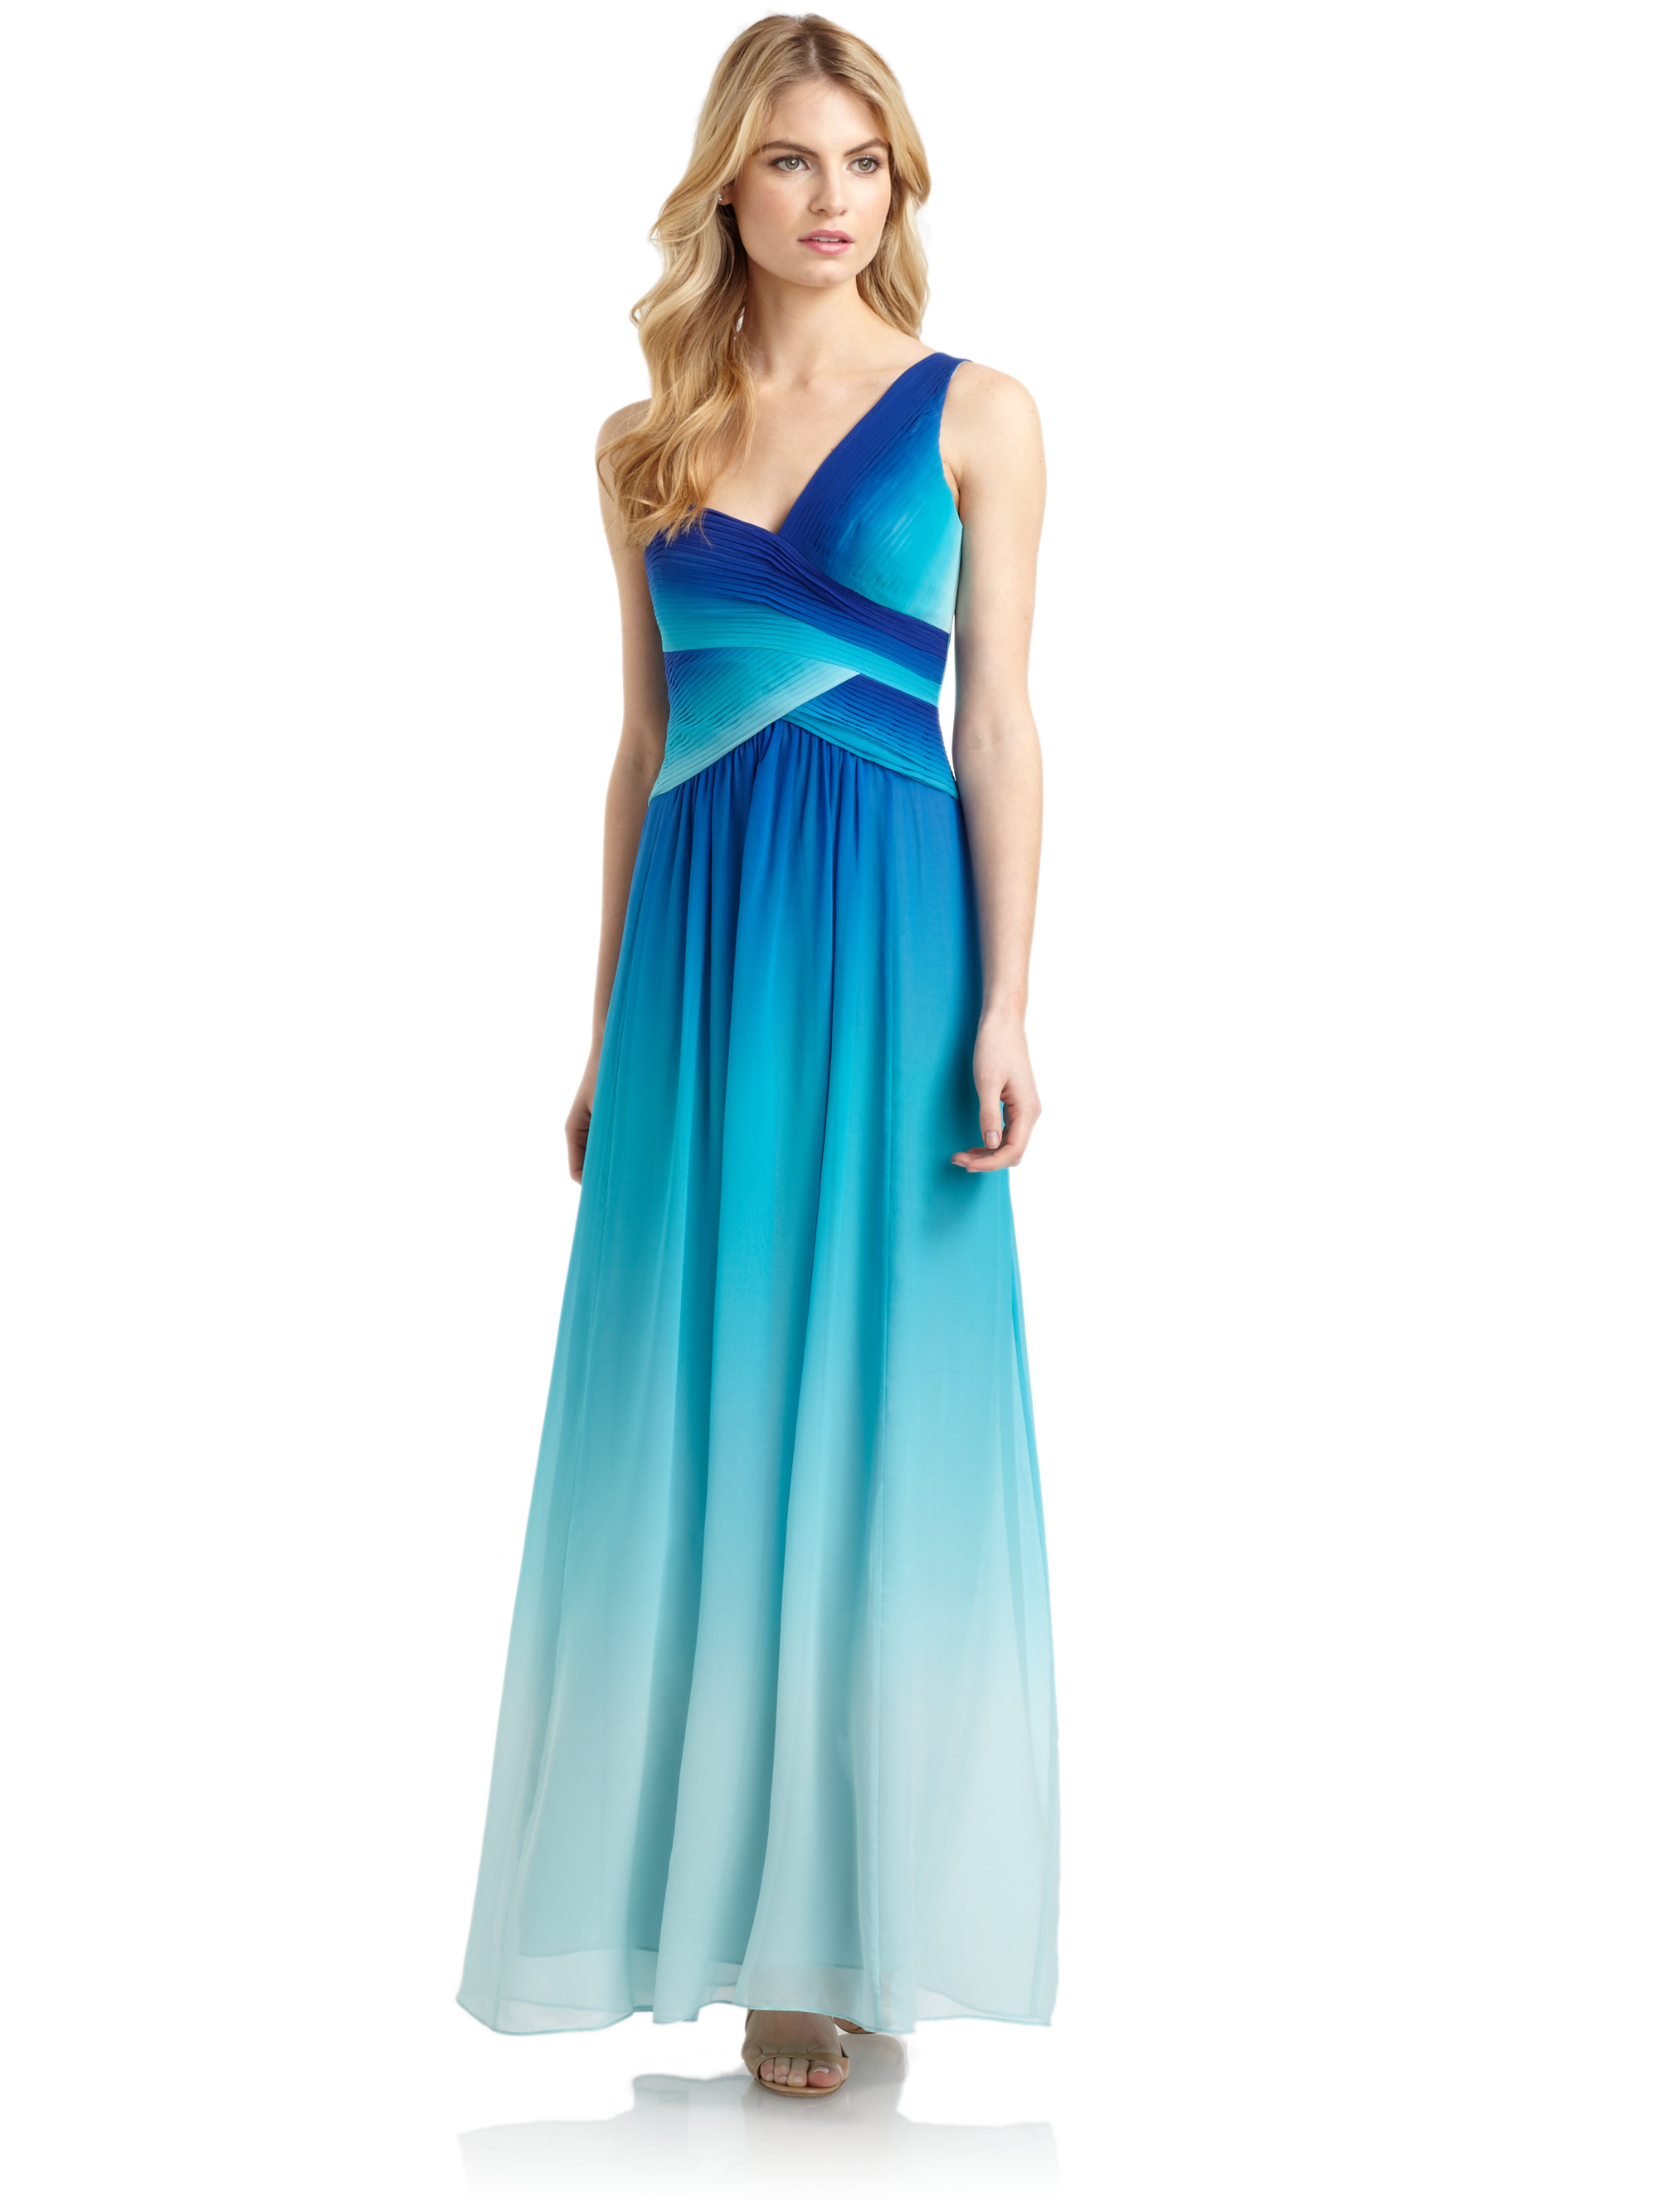 Lyst - Bcbgmaxazria Timoa Silk Chiffon Ombre One-shoulder Gown in Blue